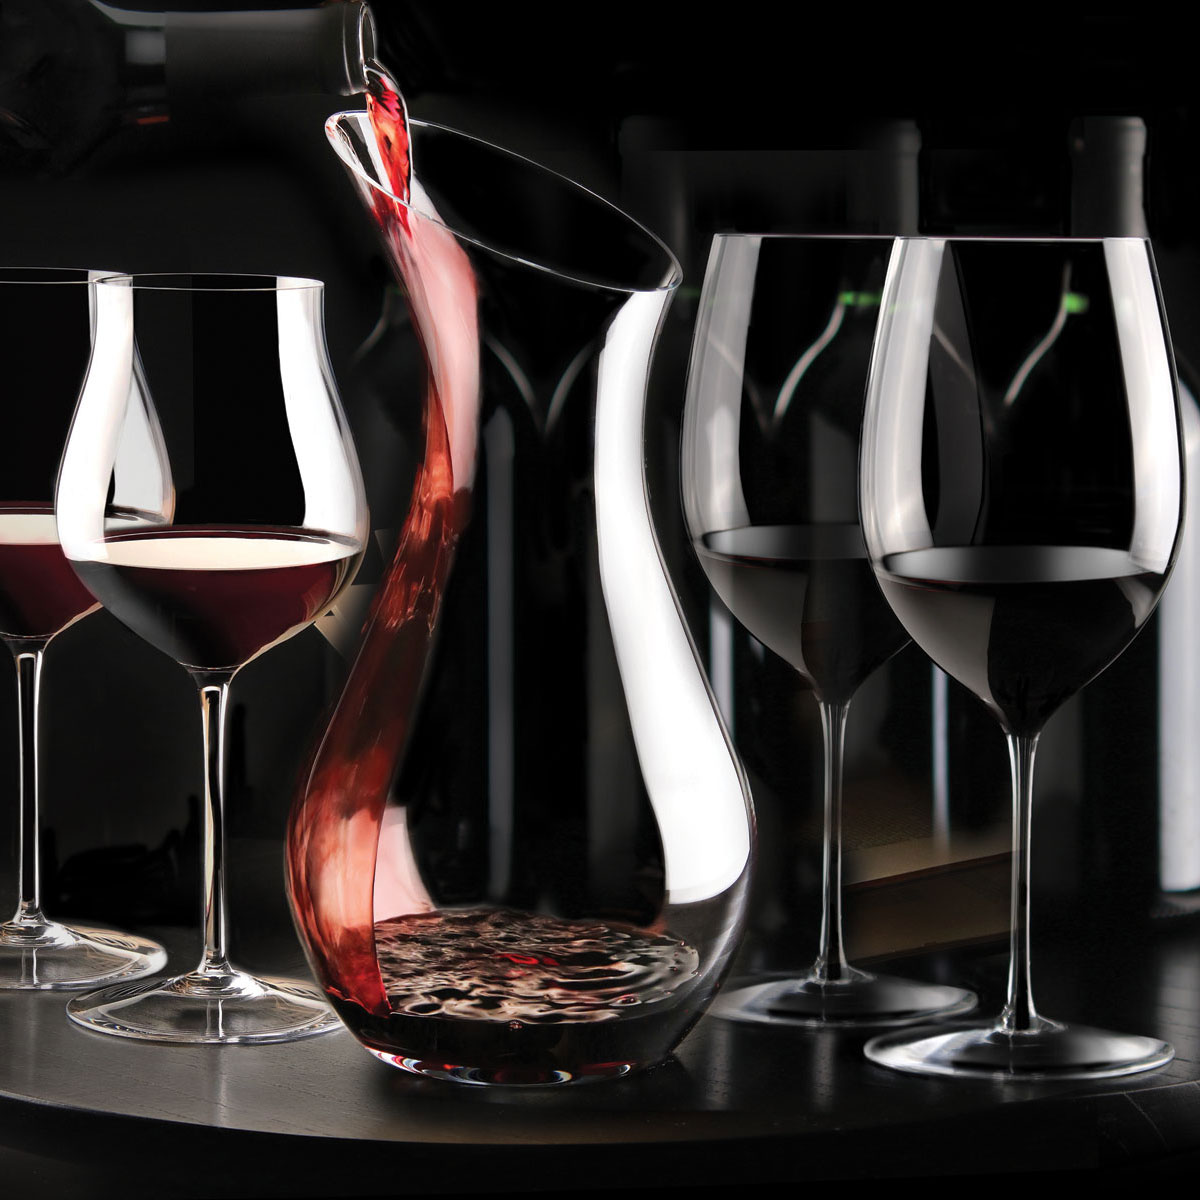 Cashs Ireland, Grand Cru Handmade, Pinot Noir Crystal Glasses, Pair